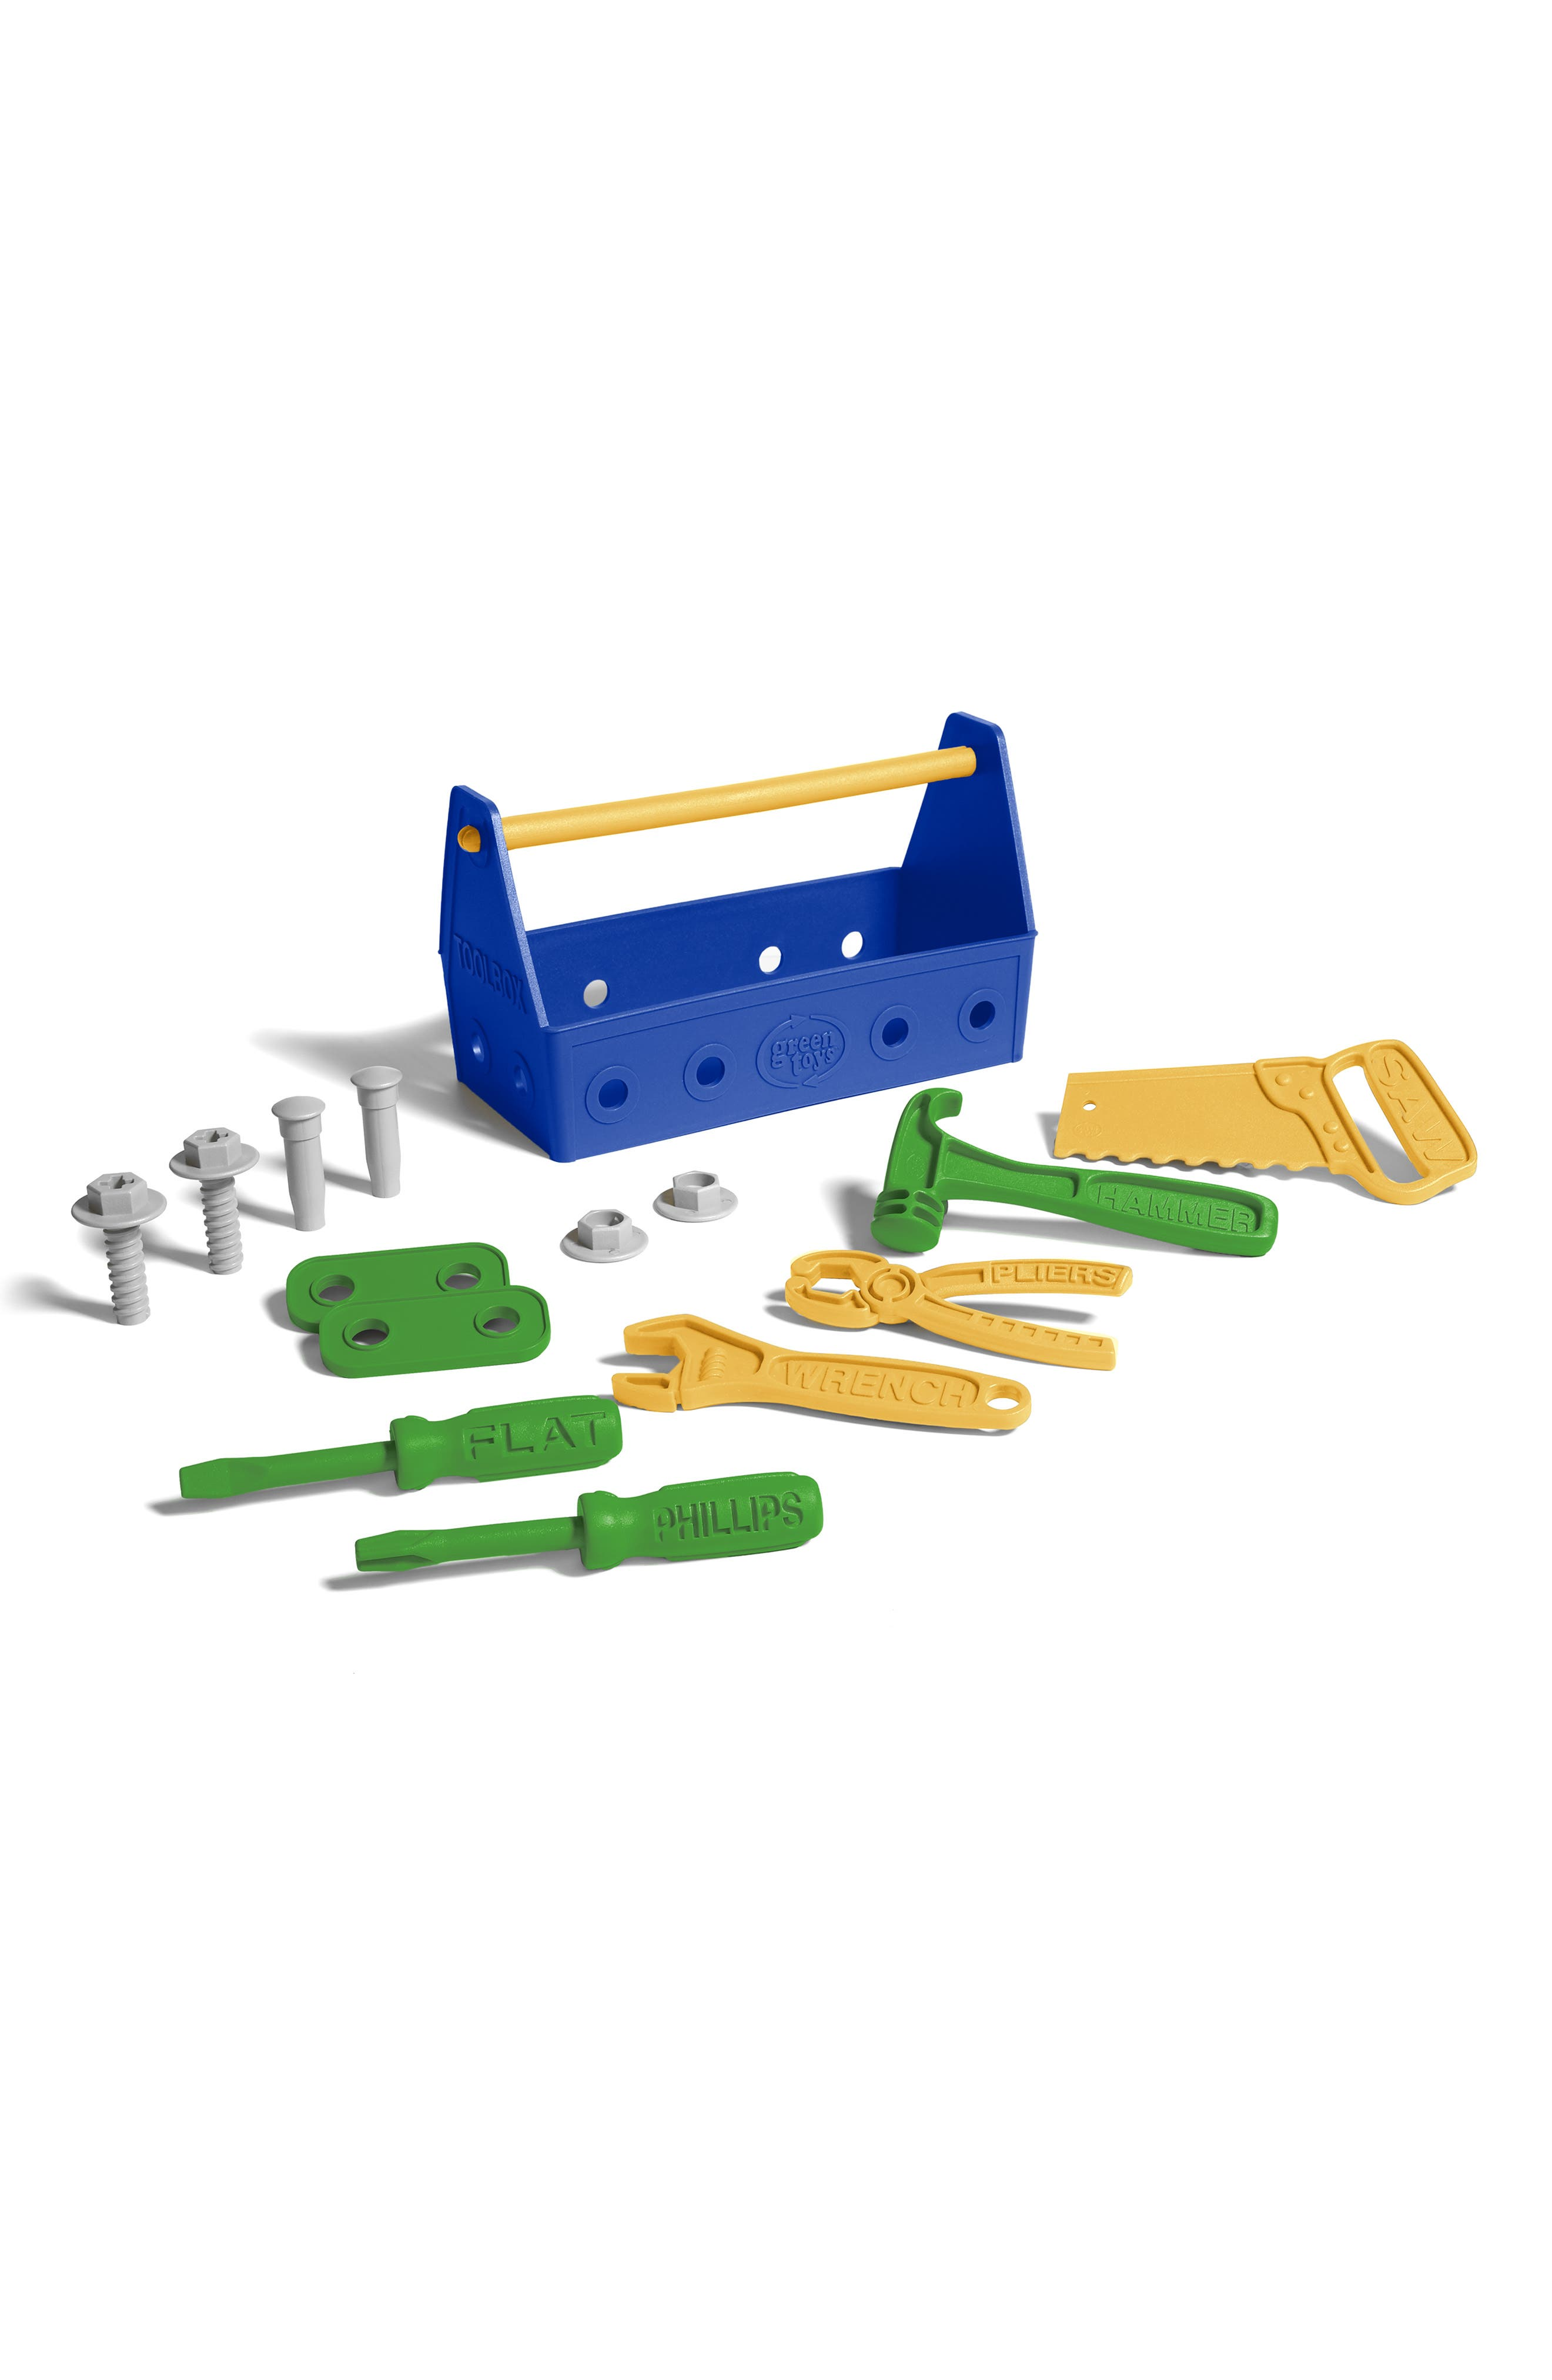 15-Piece Plastic Tool Set,                         Main,                         color, Blue